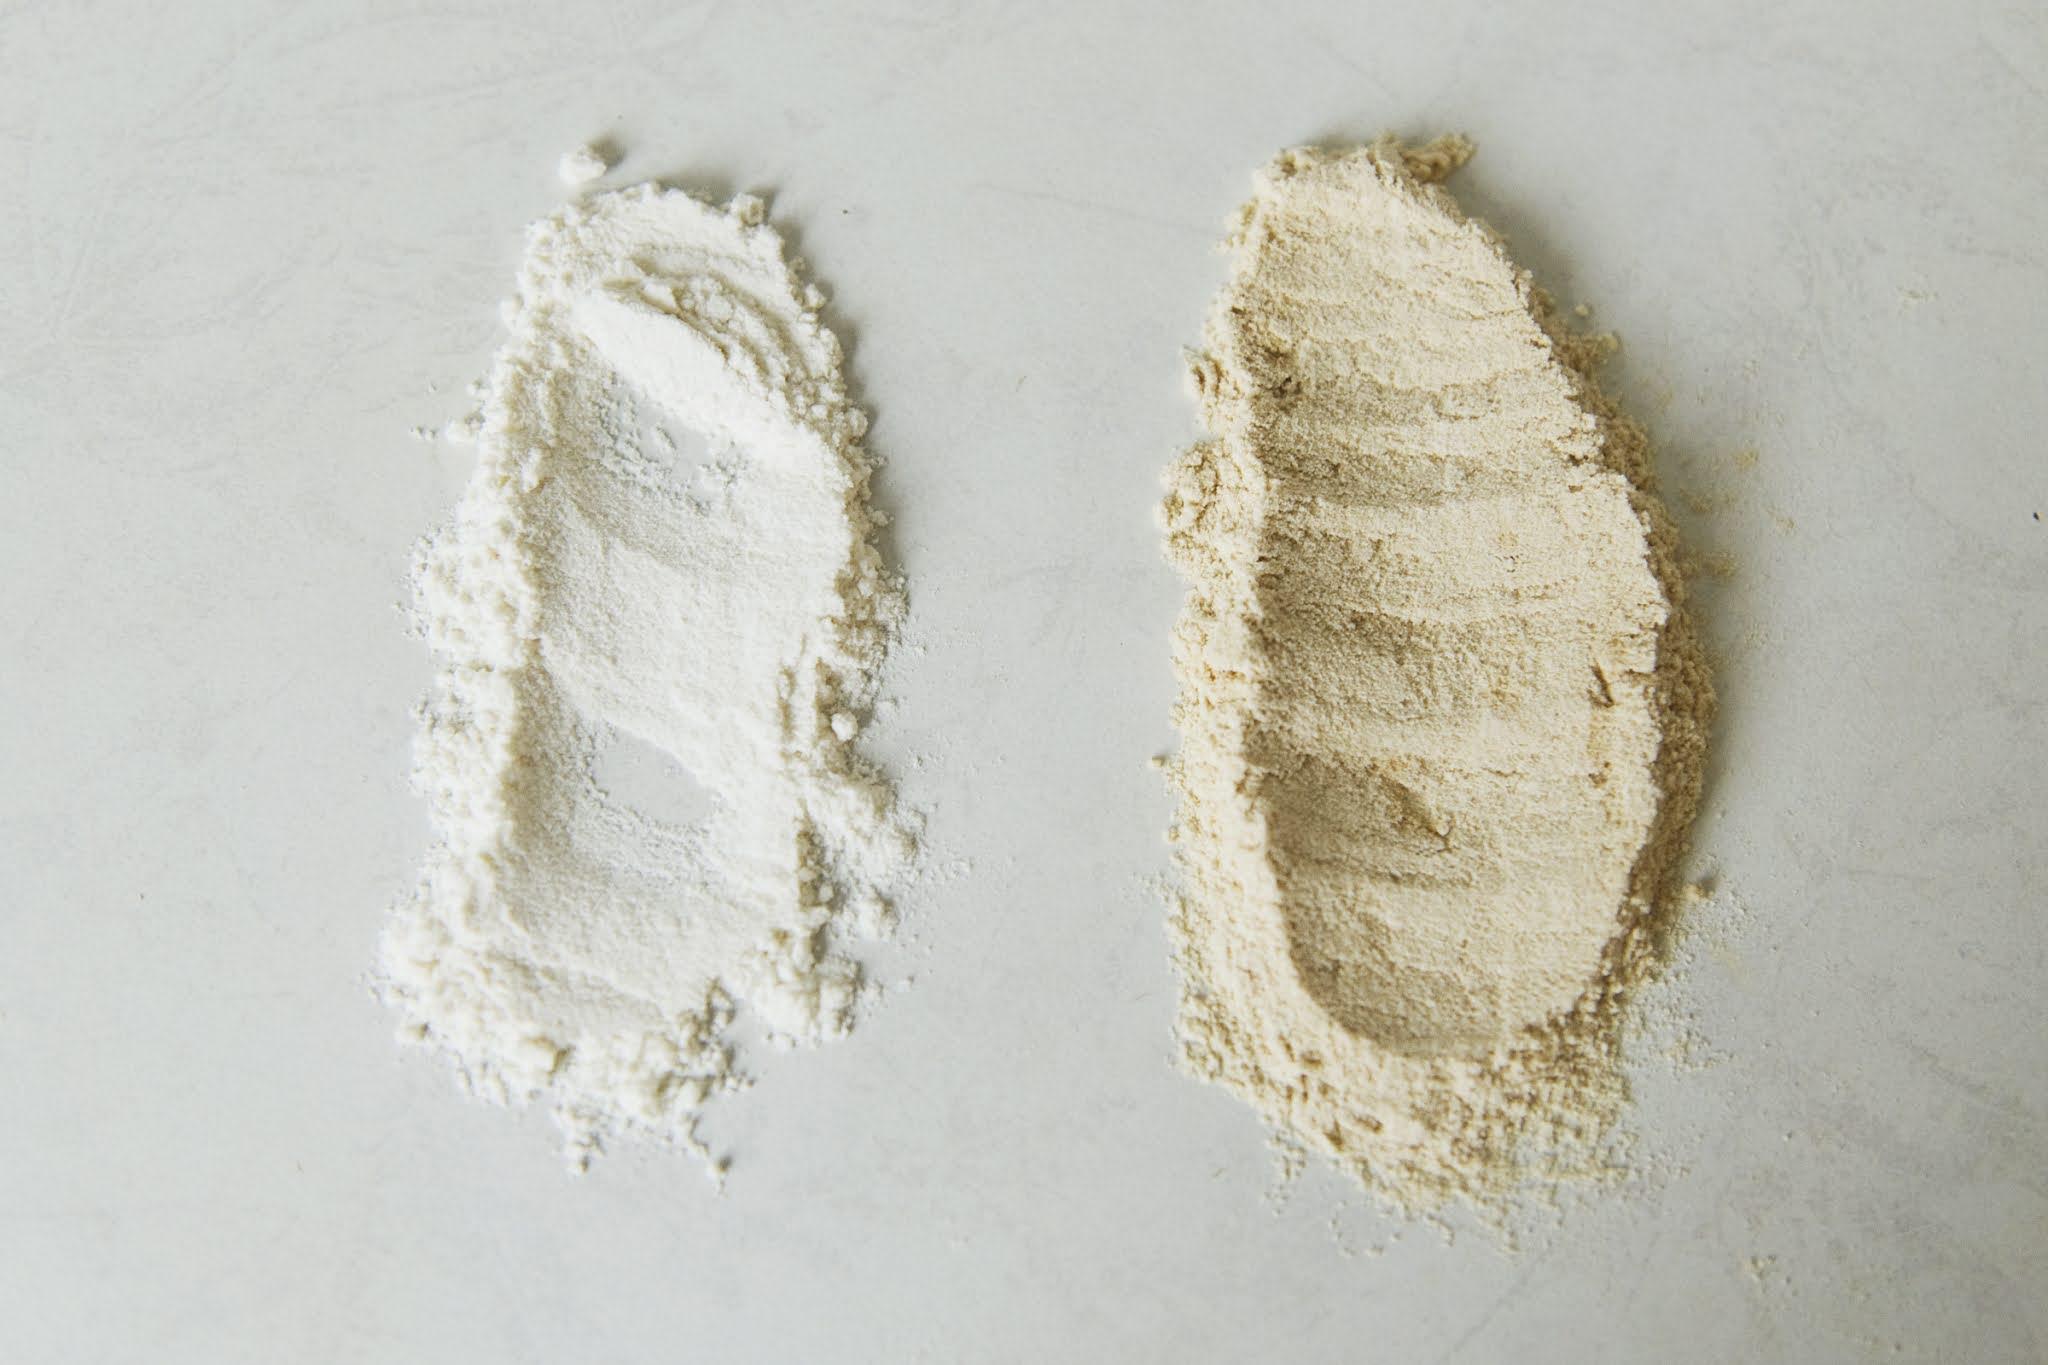 Homemade diaper rash remedy